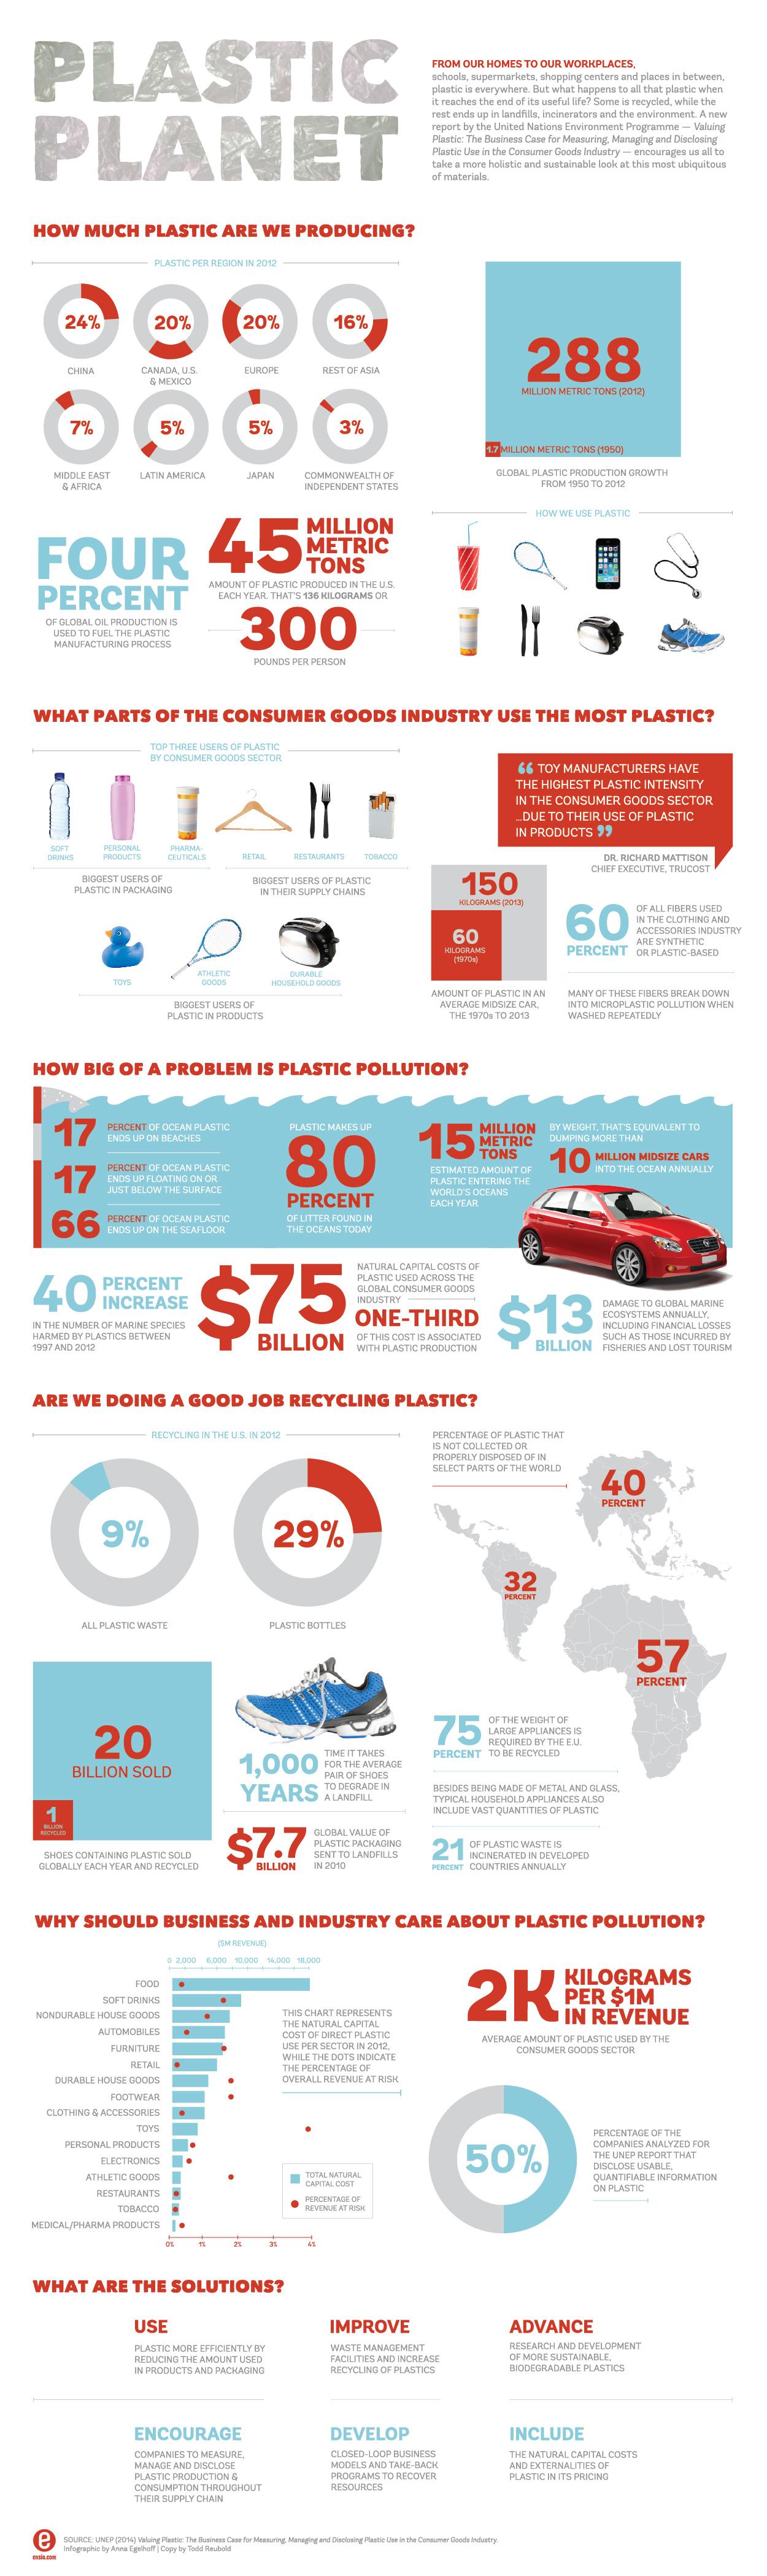 Plastic planet infographic